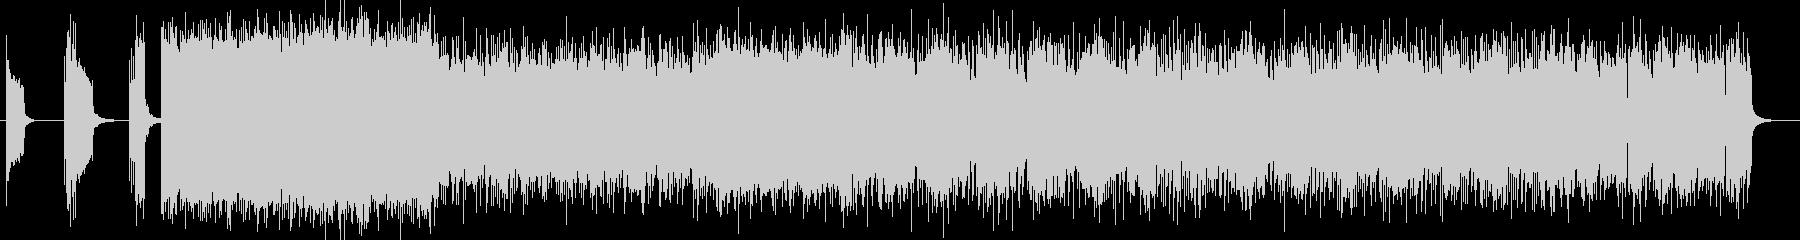 DARK、重低音系のDEATH ROCKの未再生の波形